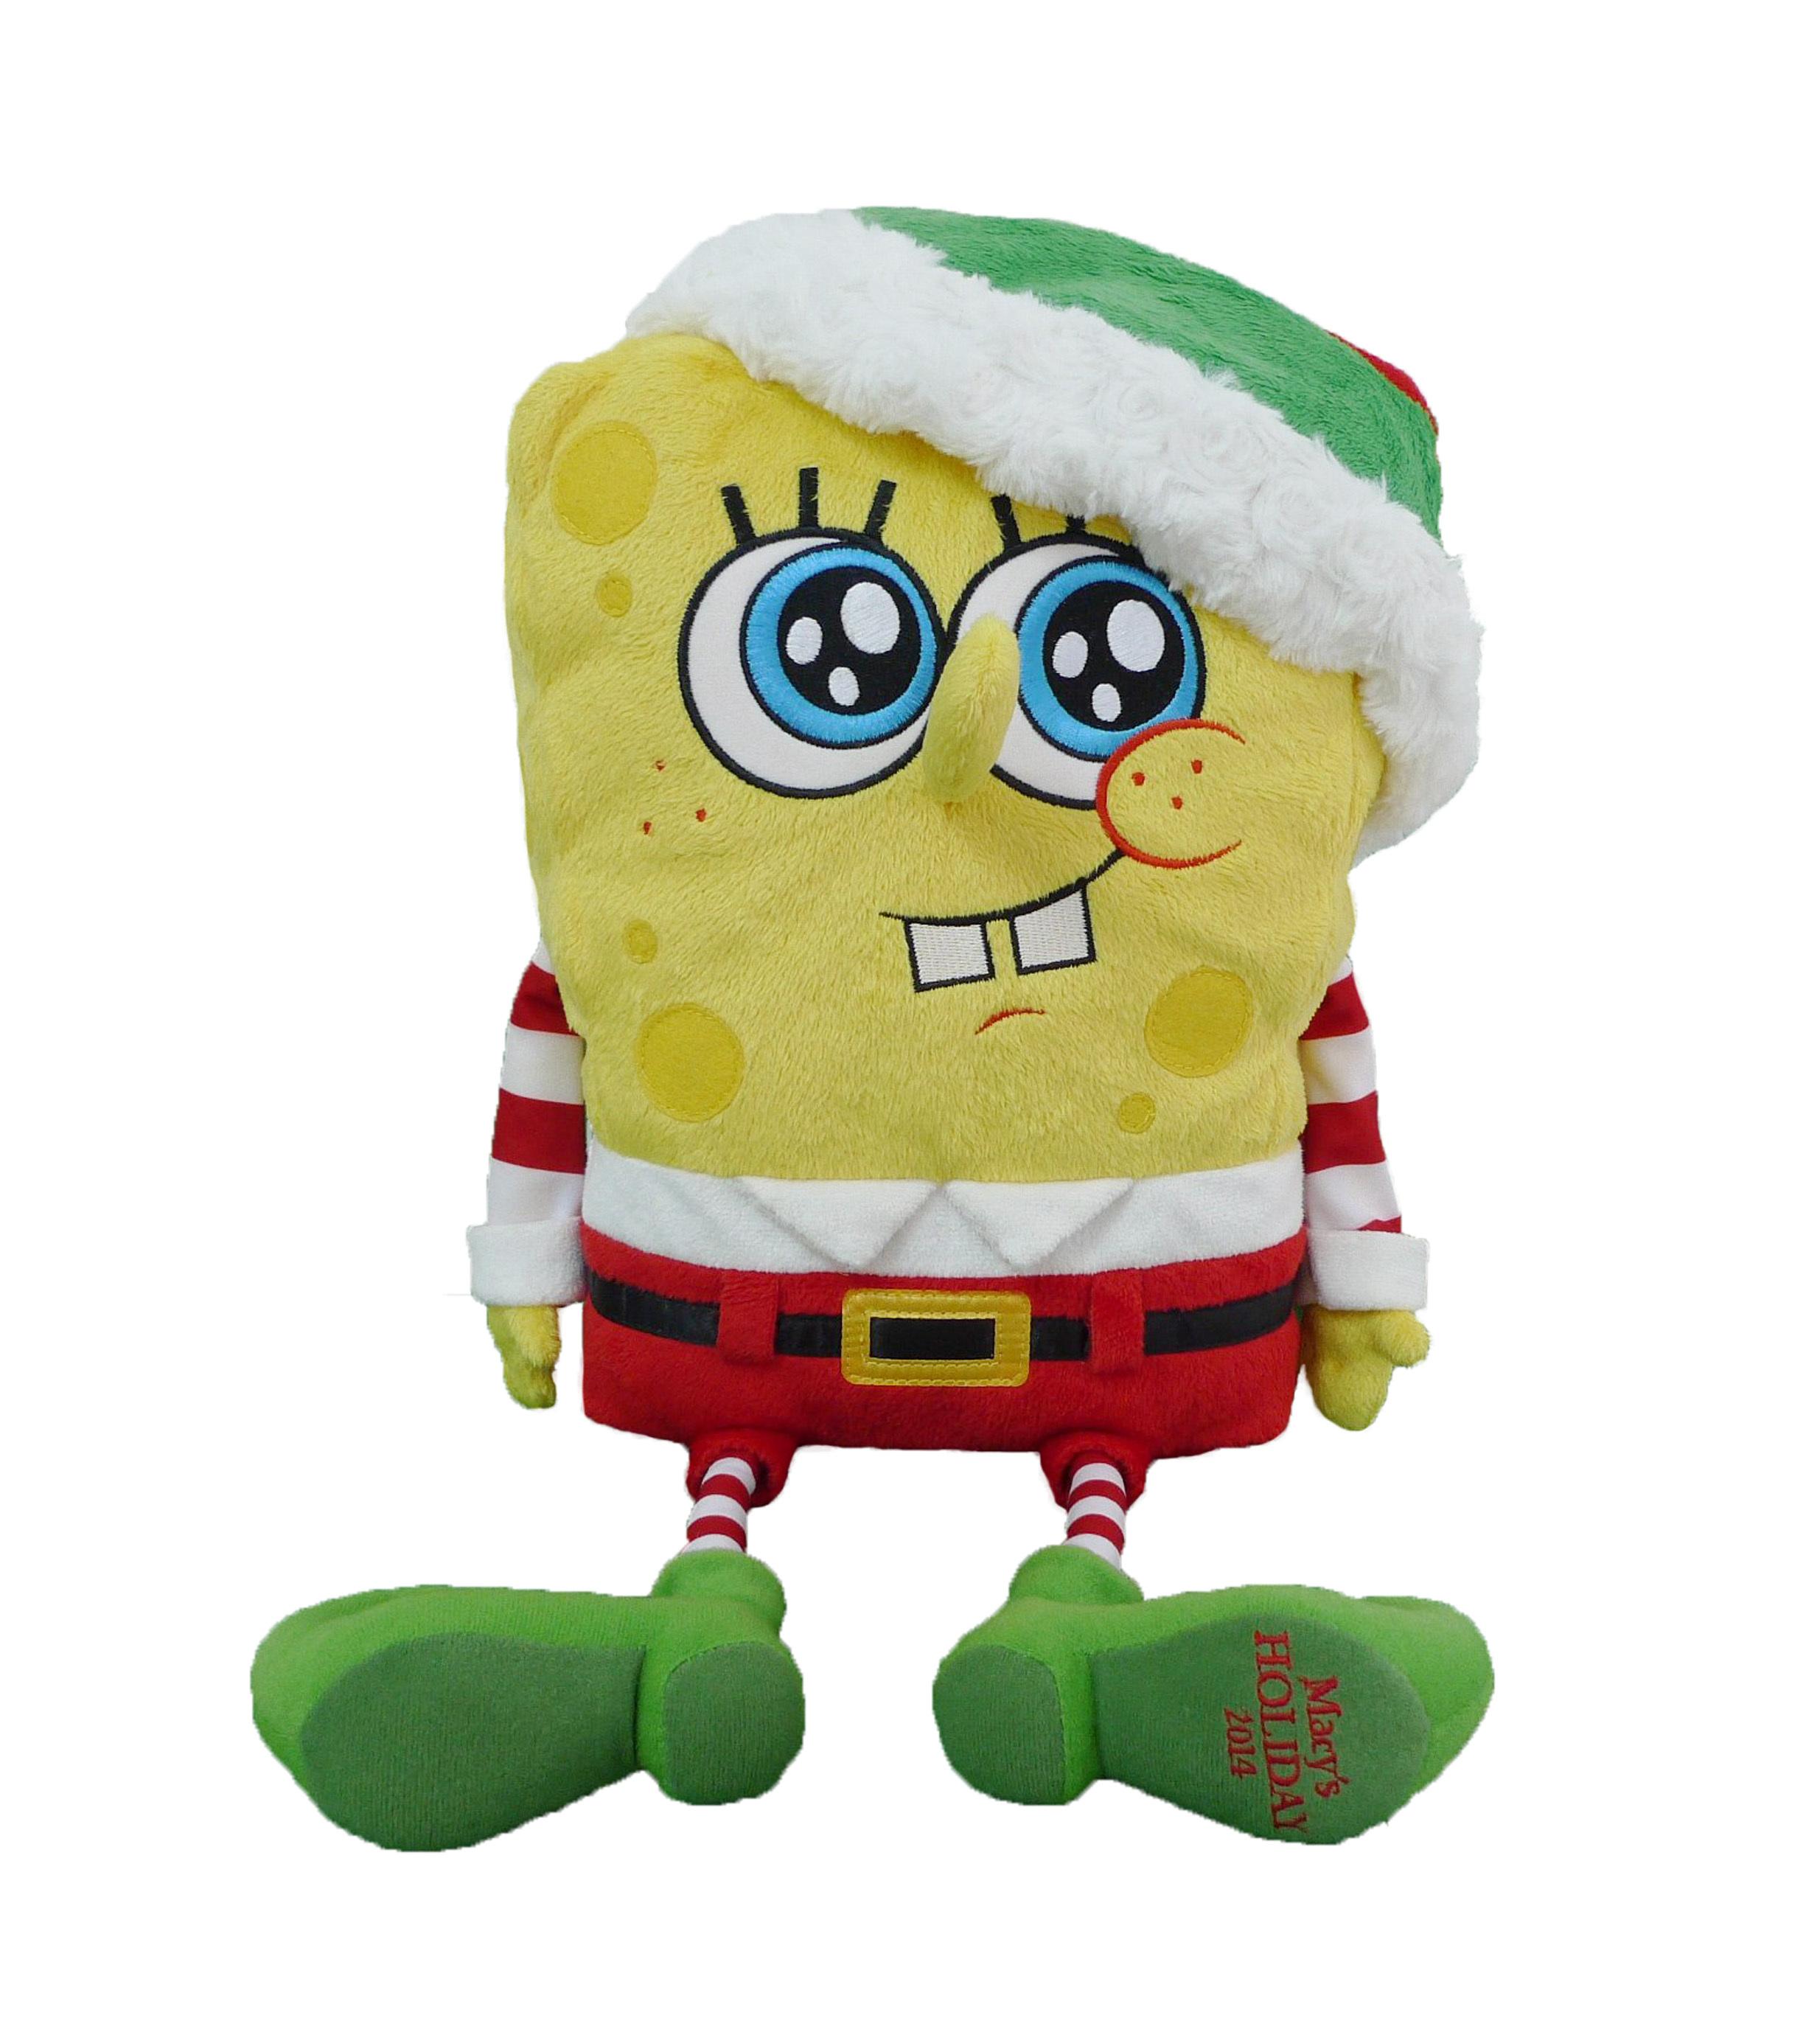 Spongebob Squarepants Hits A New Milestone Macy S Appoints World